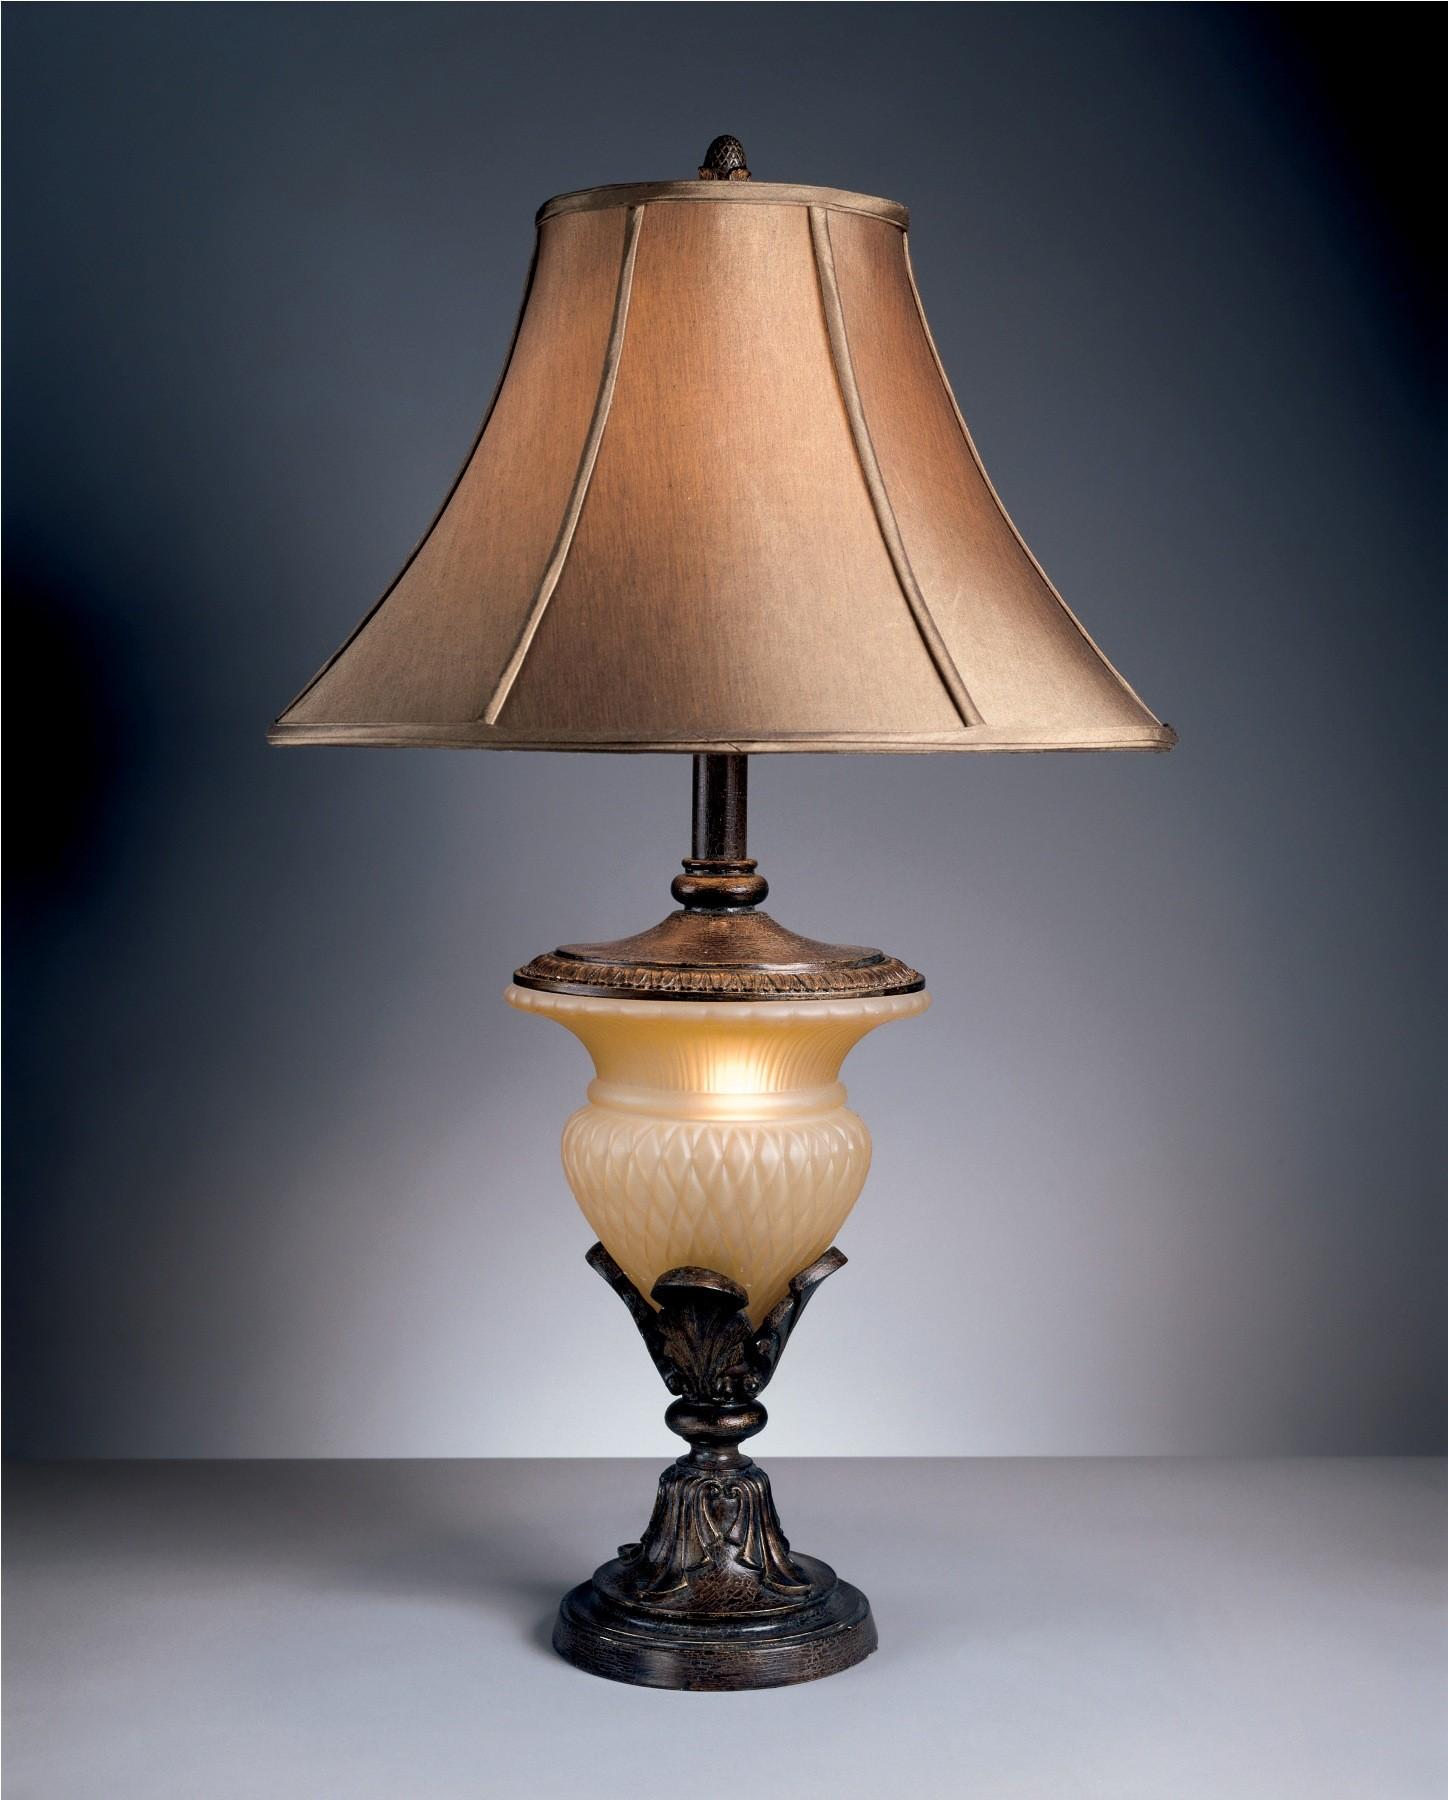 danielle table lamp set of 2 from ashley l530944 coleman furniture. Black Bedroom Furniture Sets. Home Design Ideas